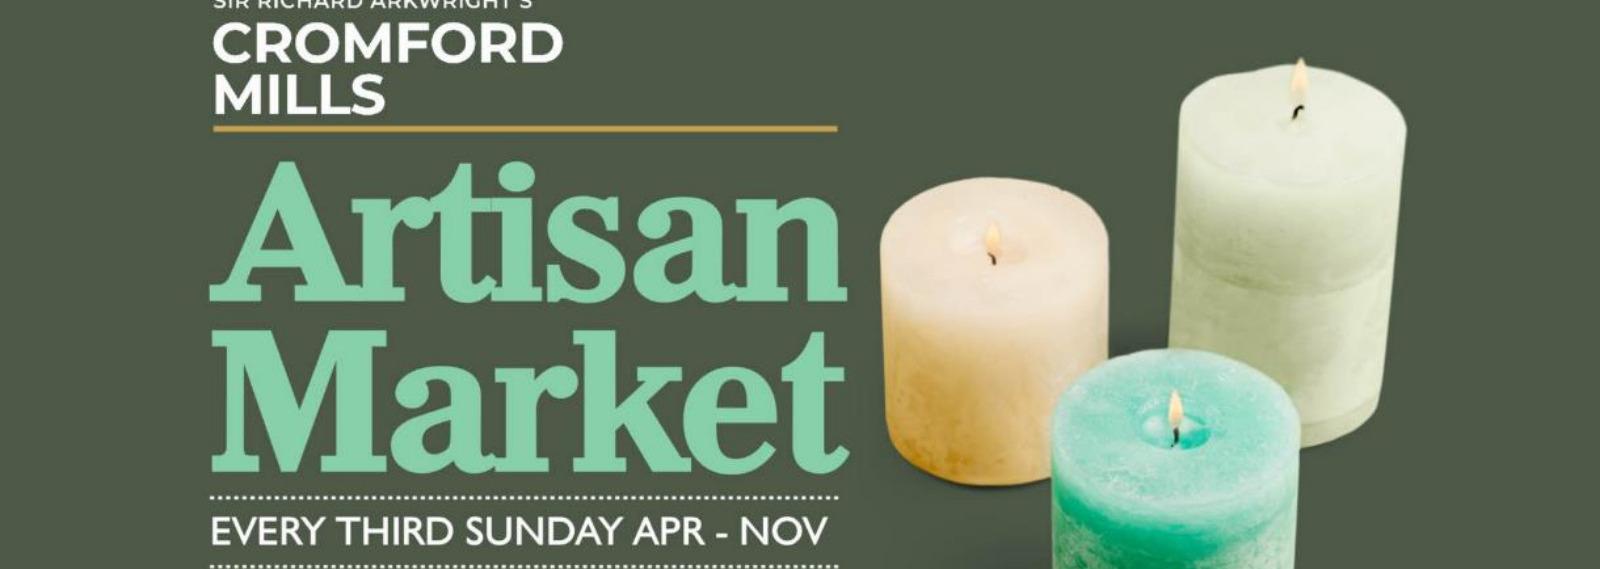 Artisan Market - Derby Days Out